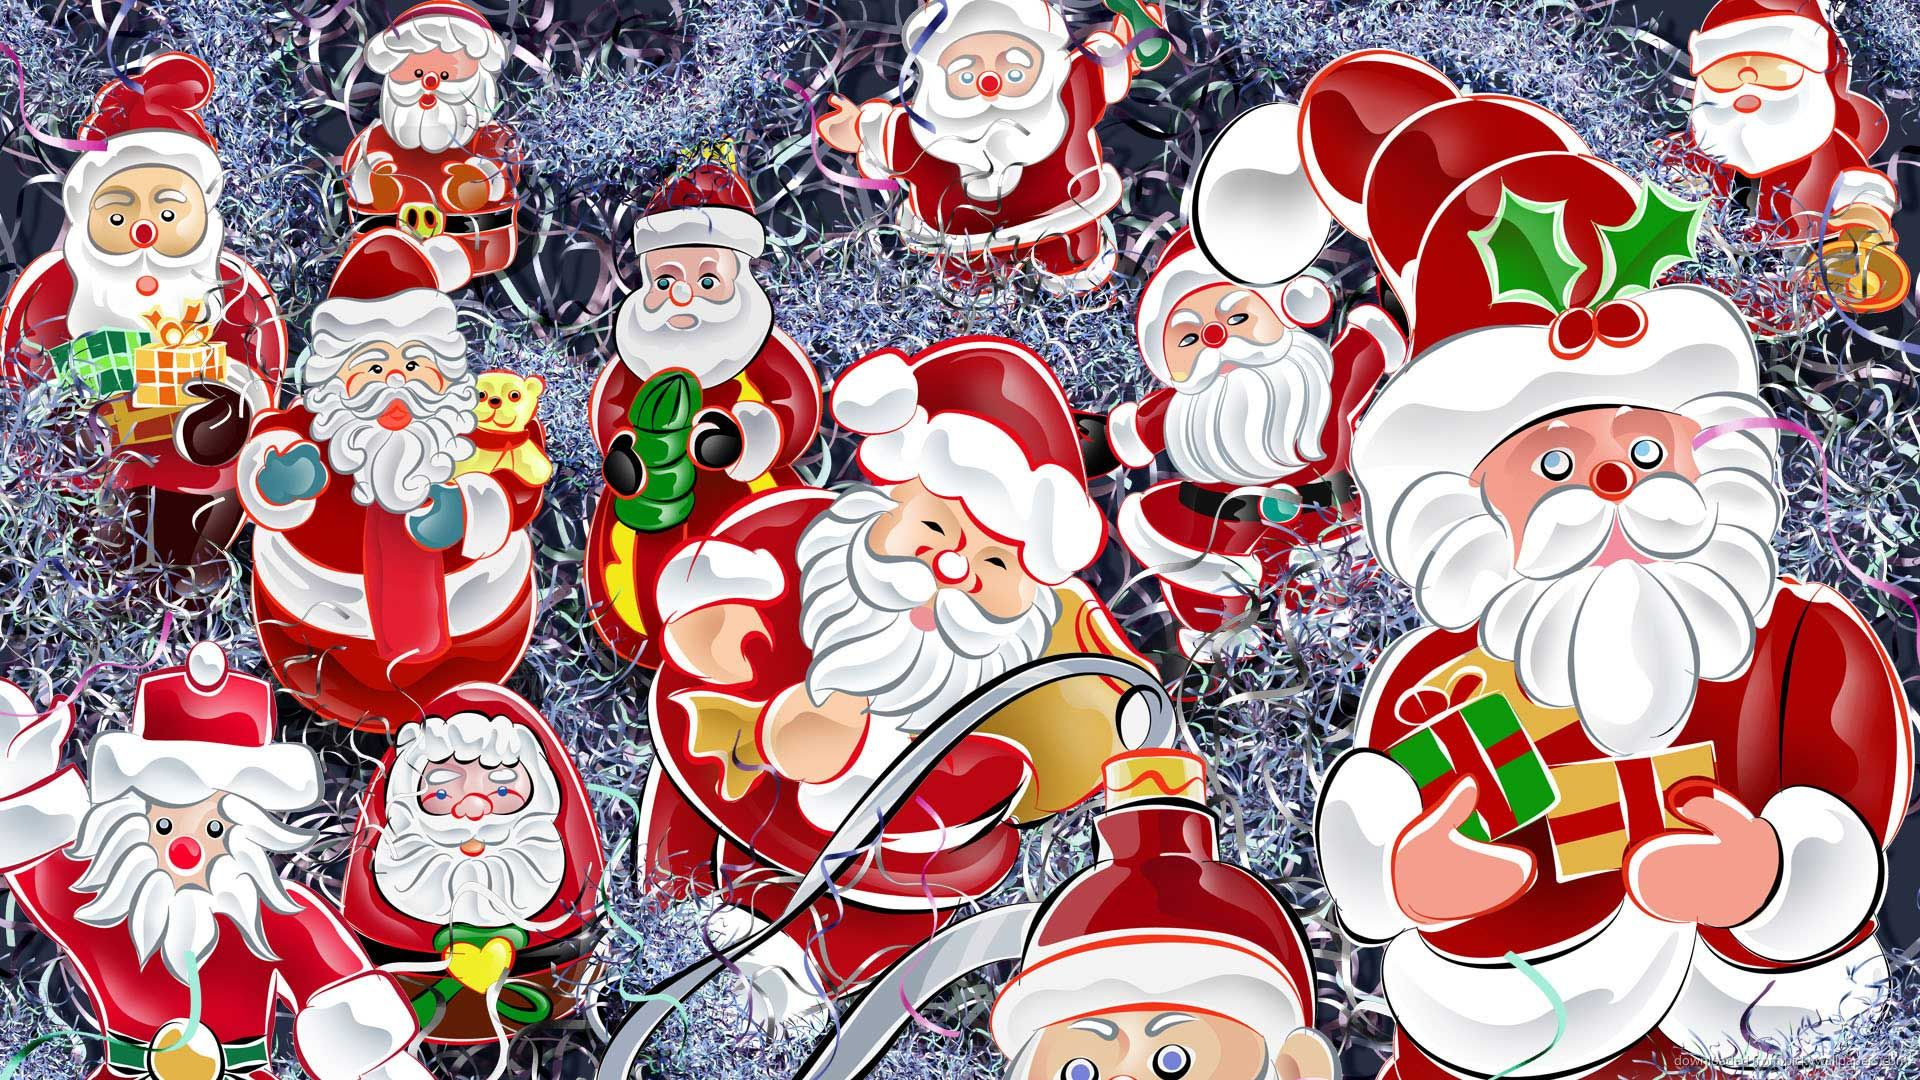 Santa Claus full screen hd wallpaper